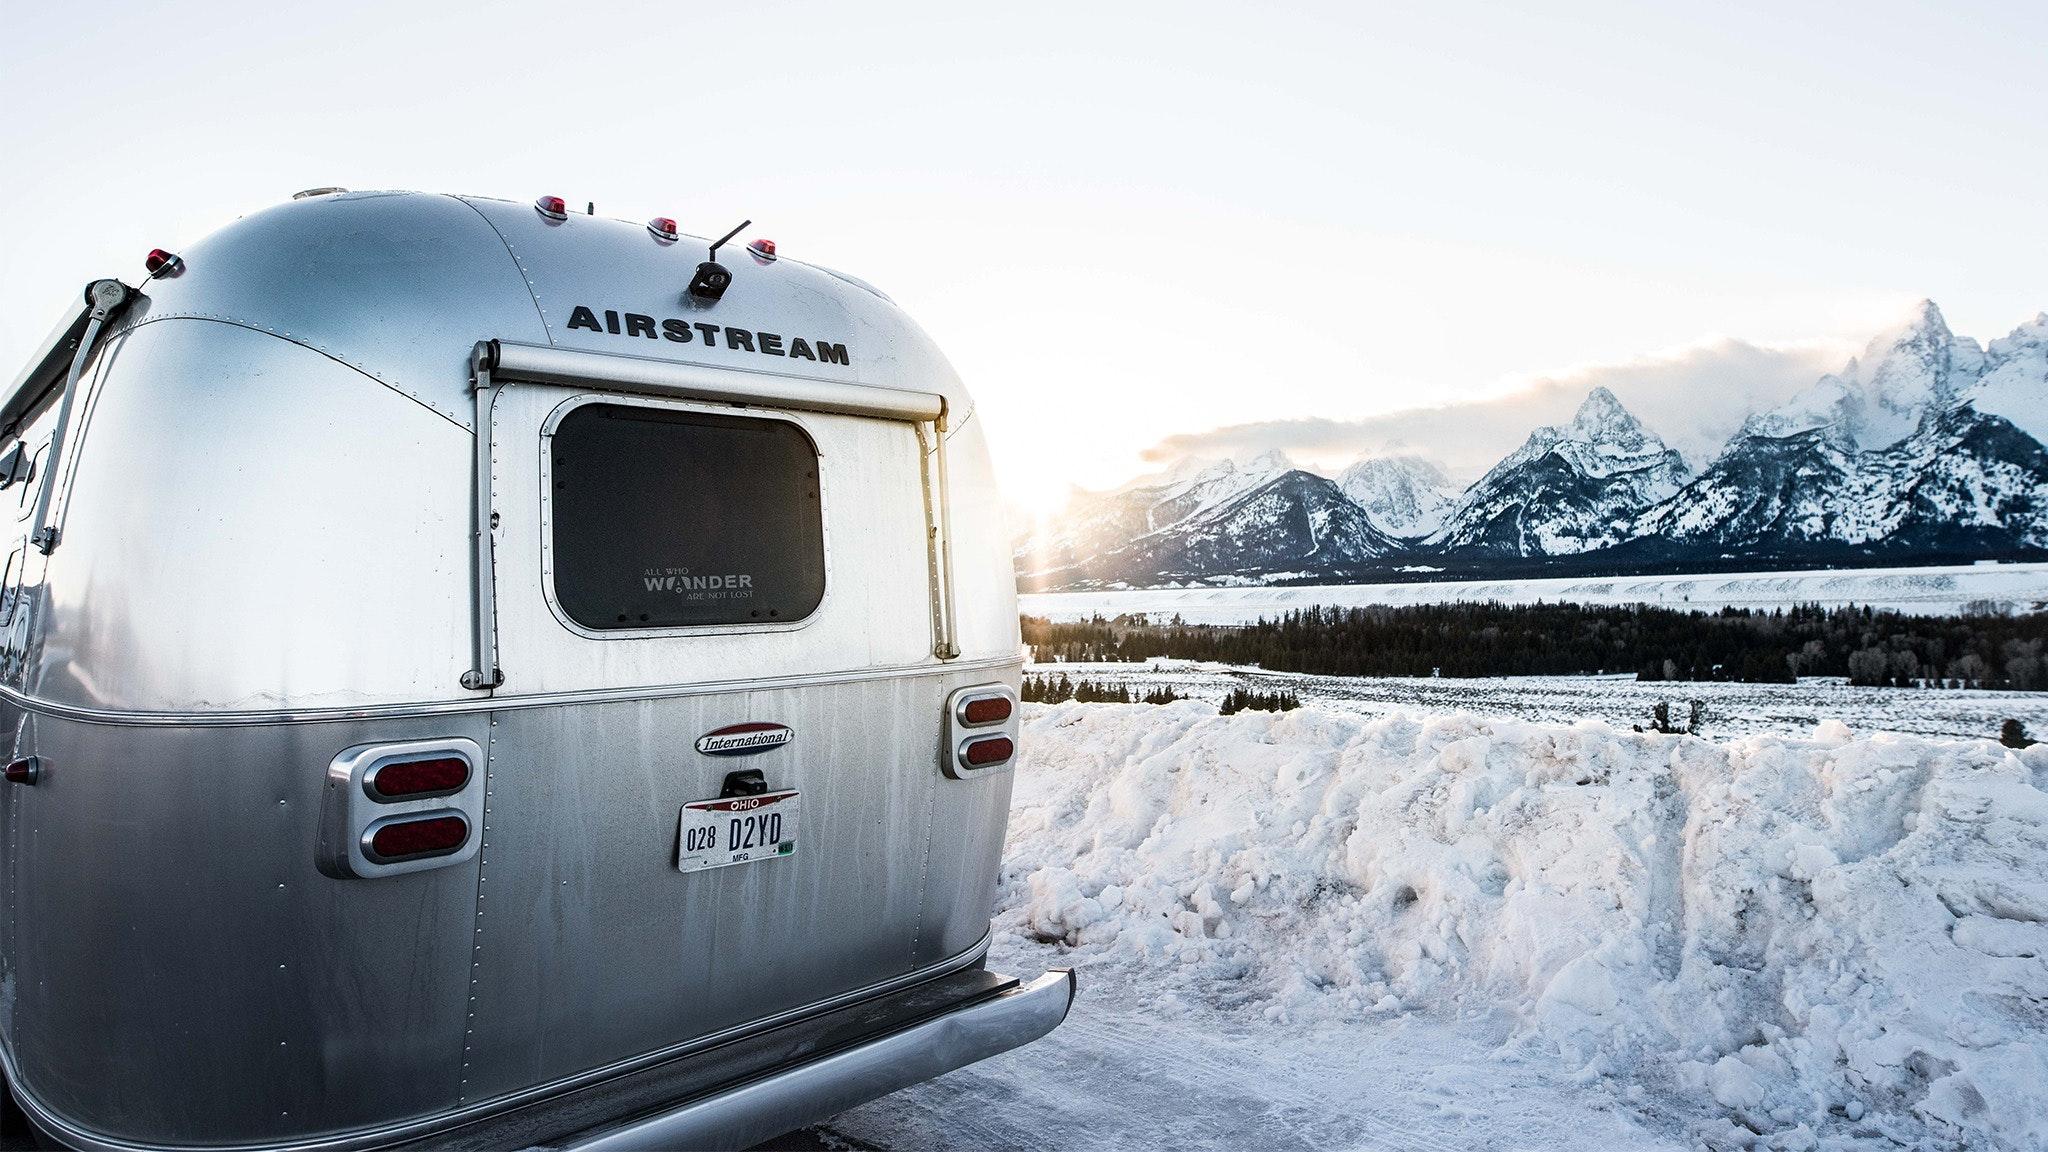 Airstream-Endless-Caravan-Winter-Camping-1.0-feature